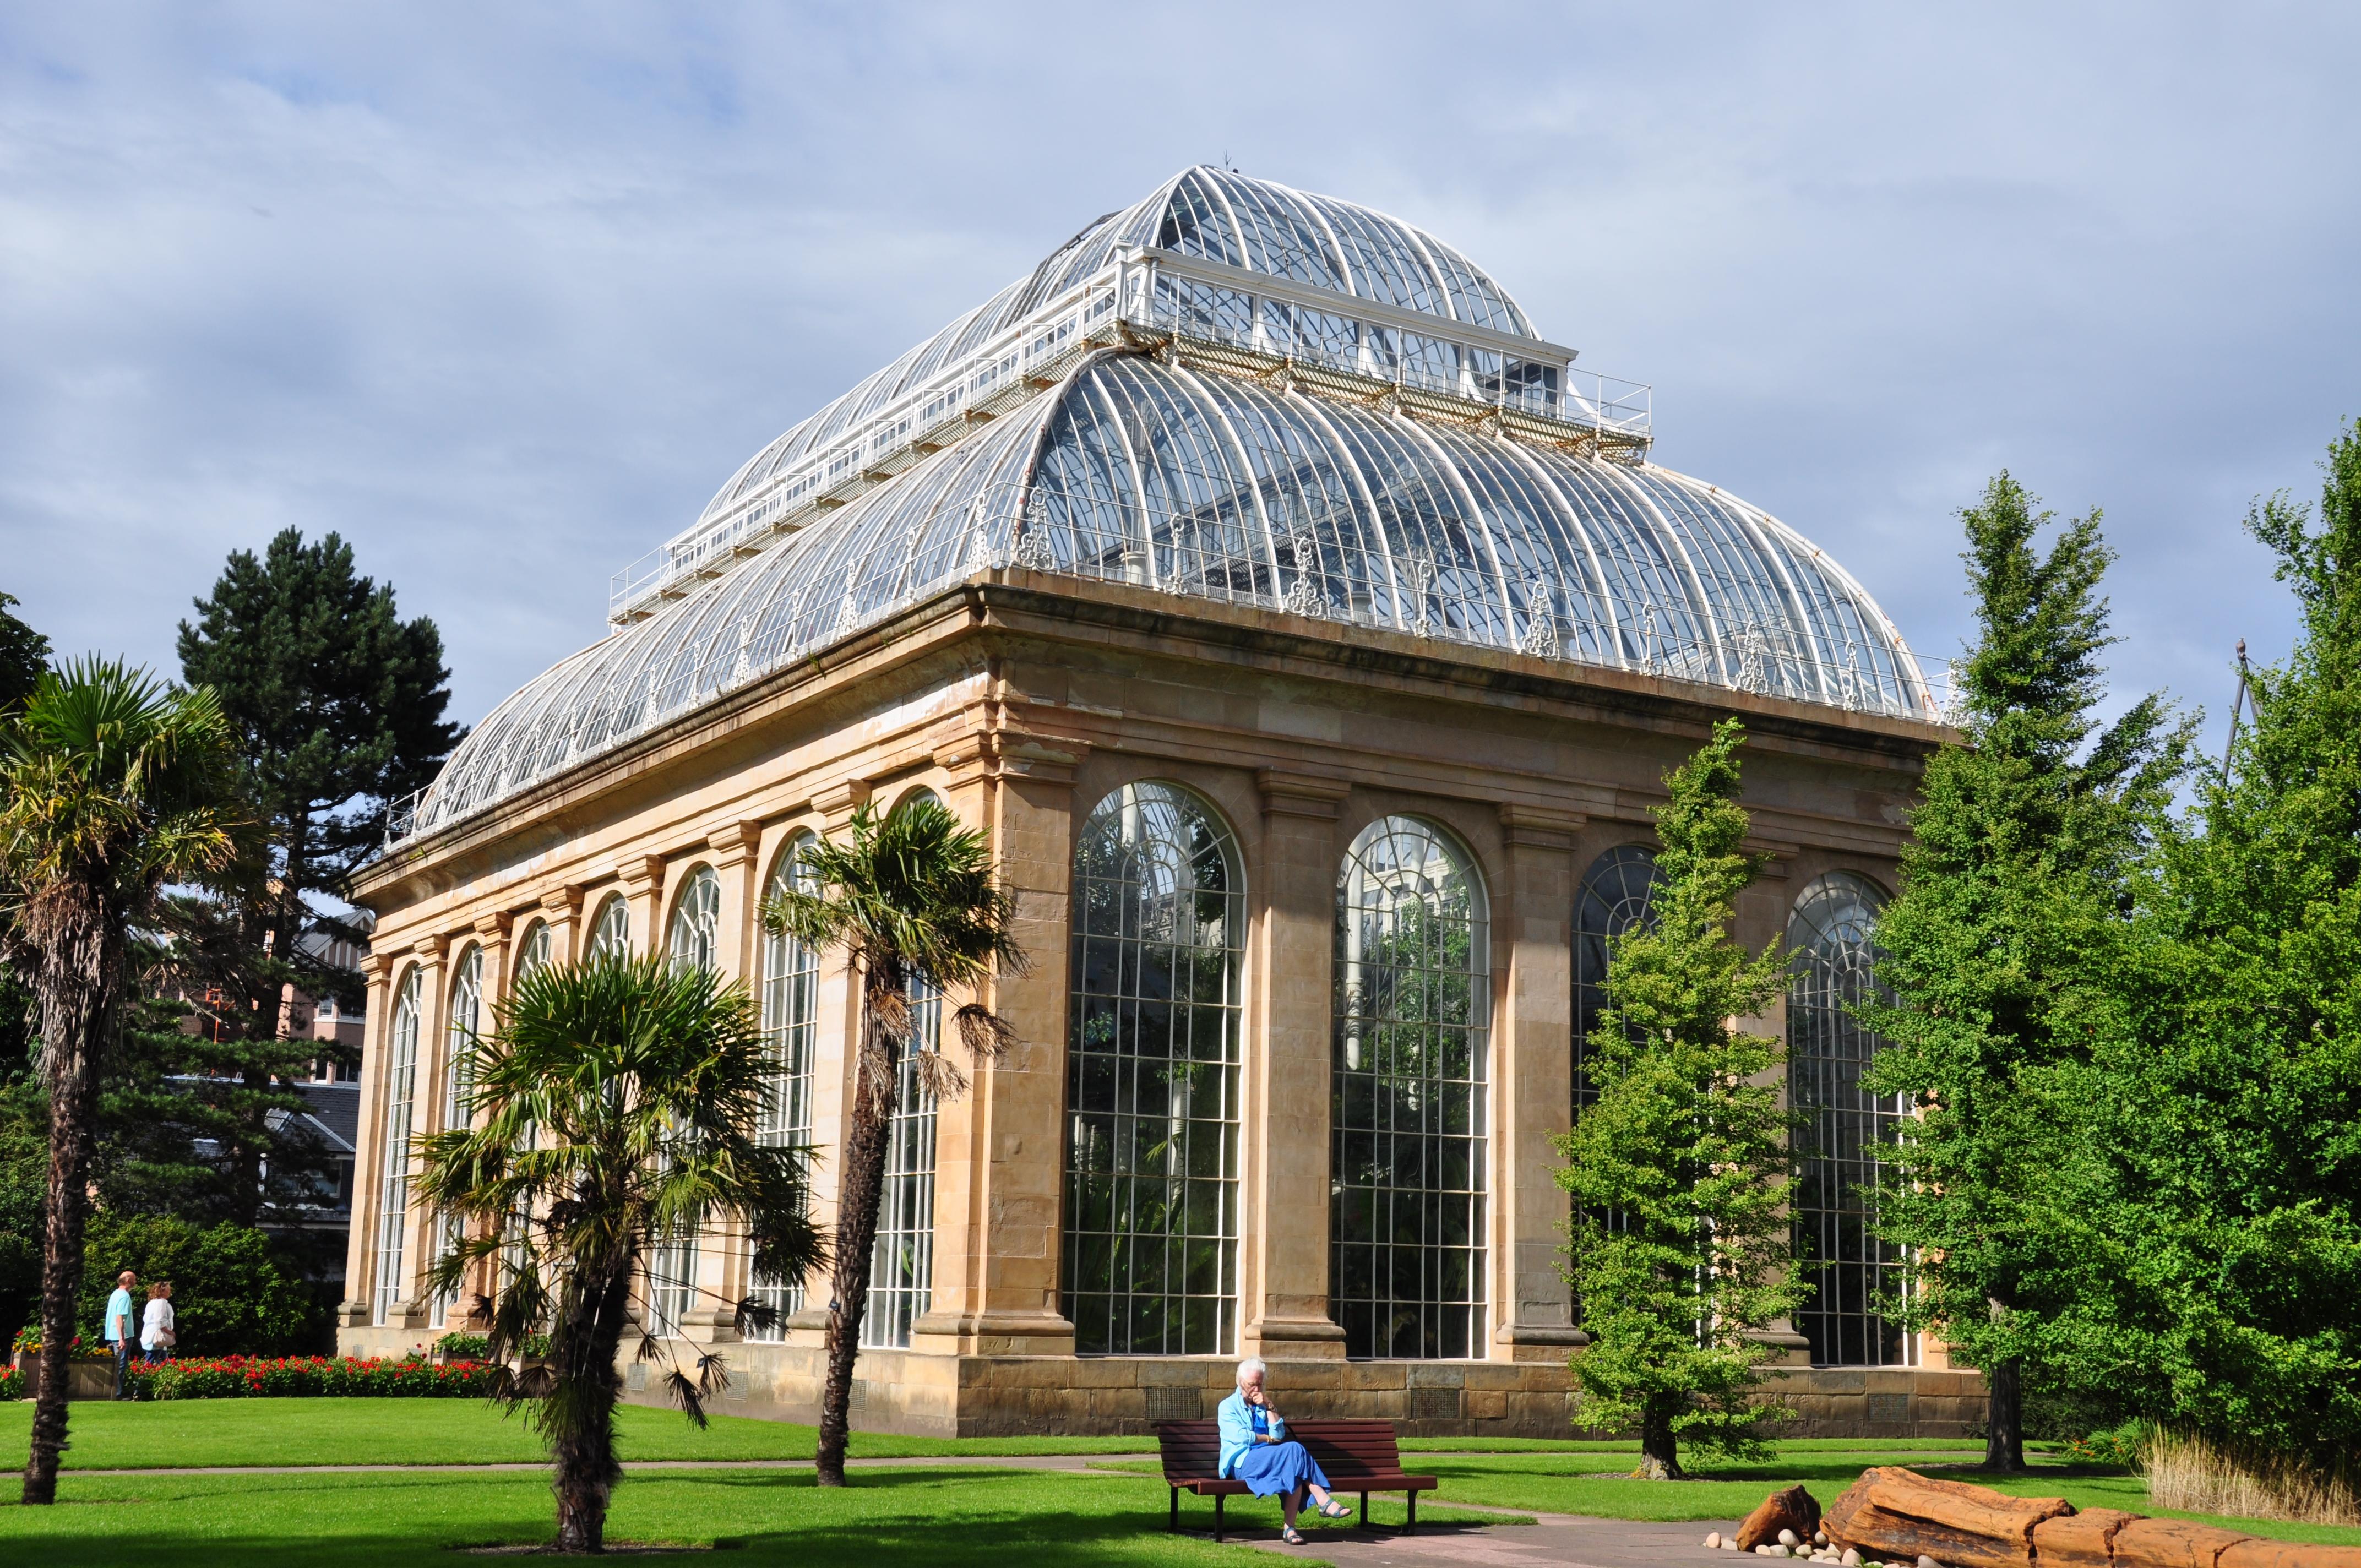 File:Greenhouse_at_the_royal_botanic_garden_of_Edinburgh on Building A Greenhouse